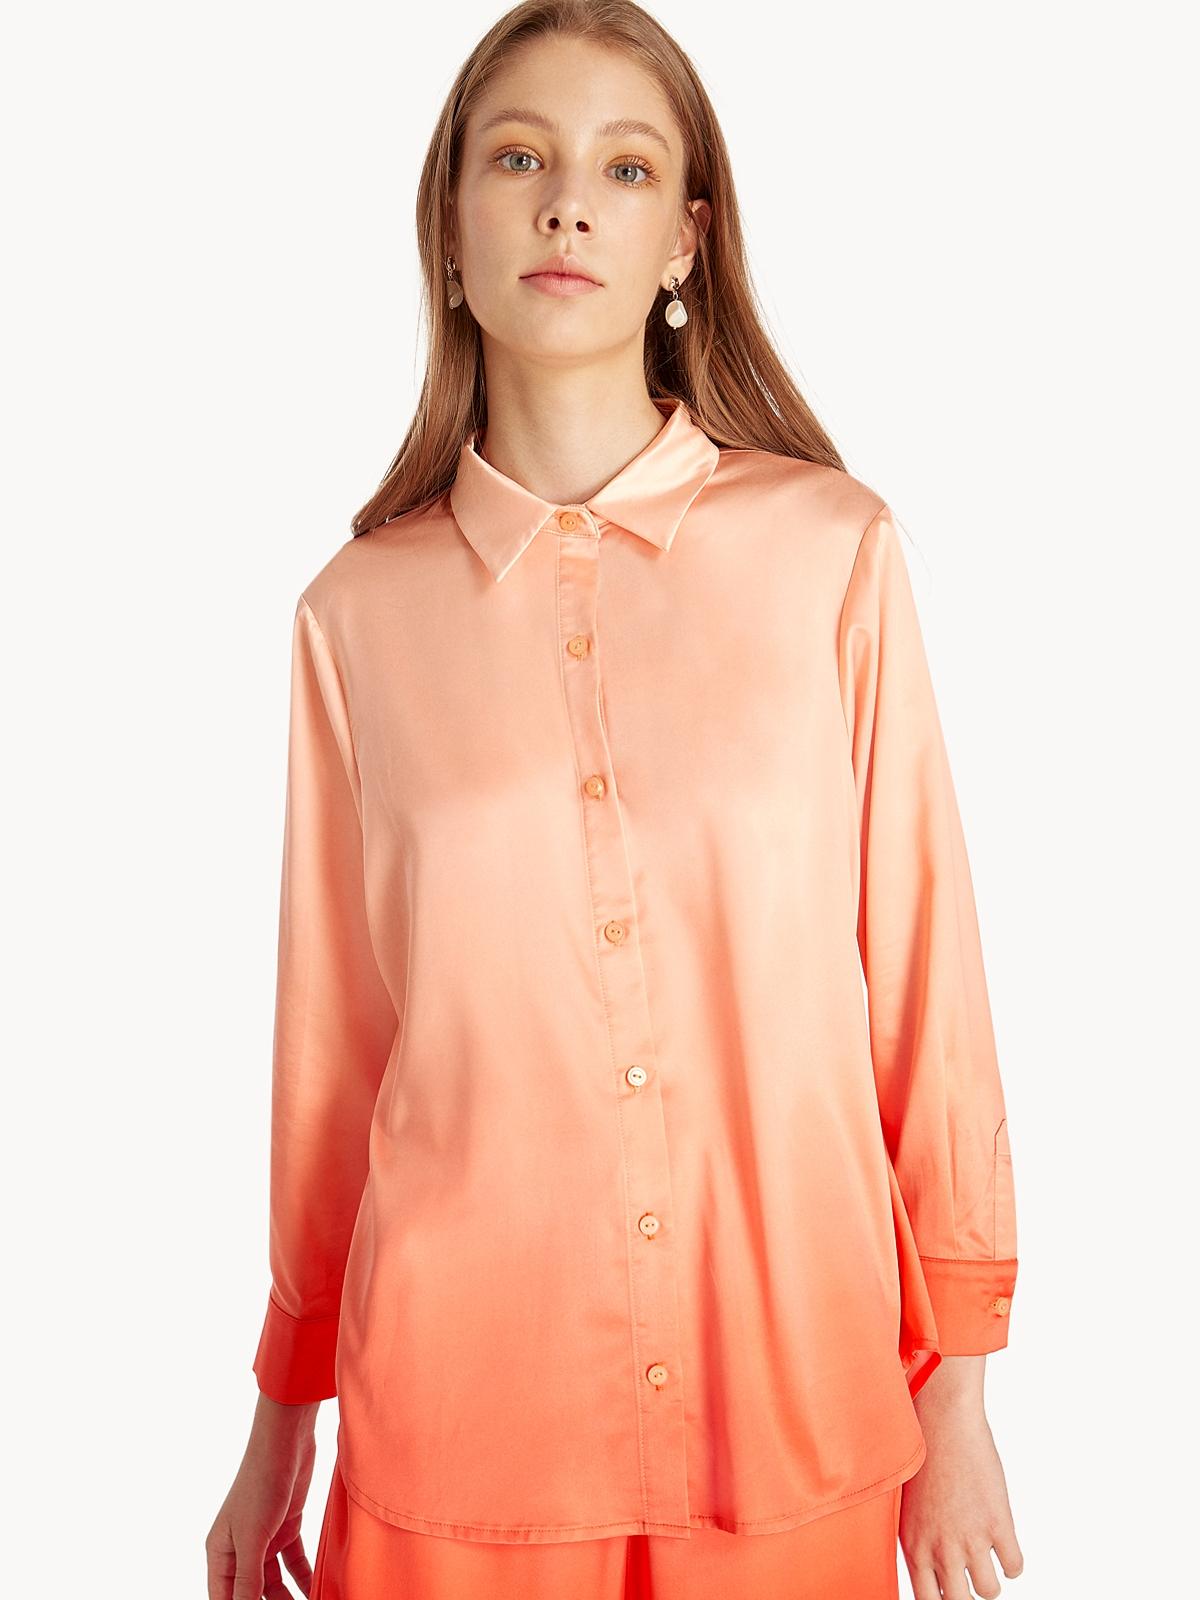 455f0dfa7 Satin Ombre Button Up Shirt - Orange - Pomelo Fashion